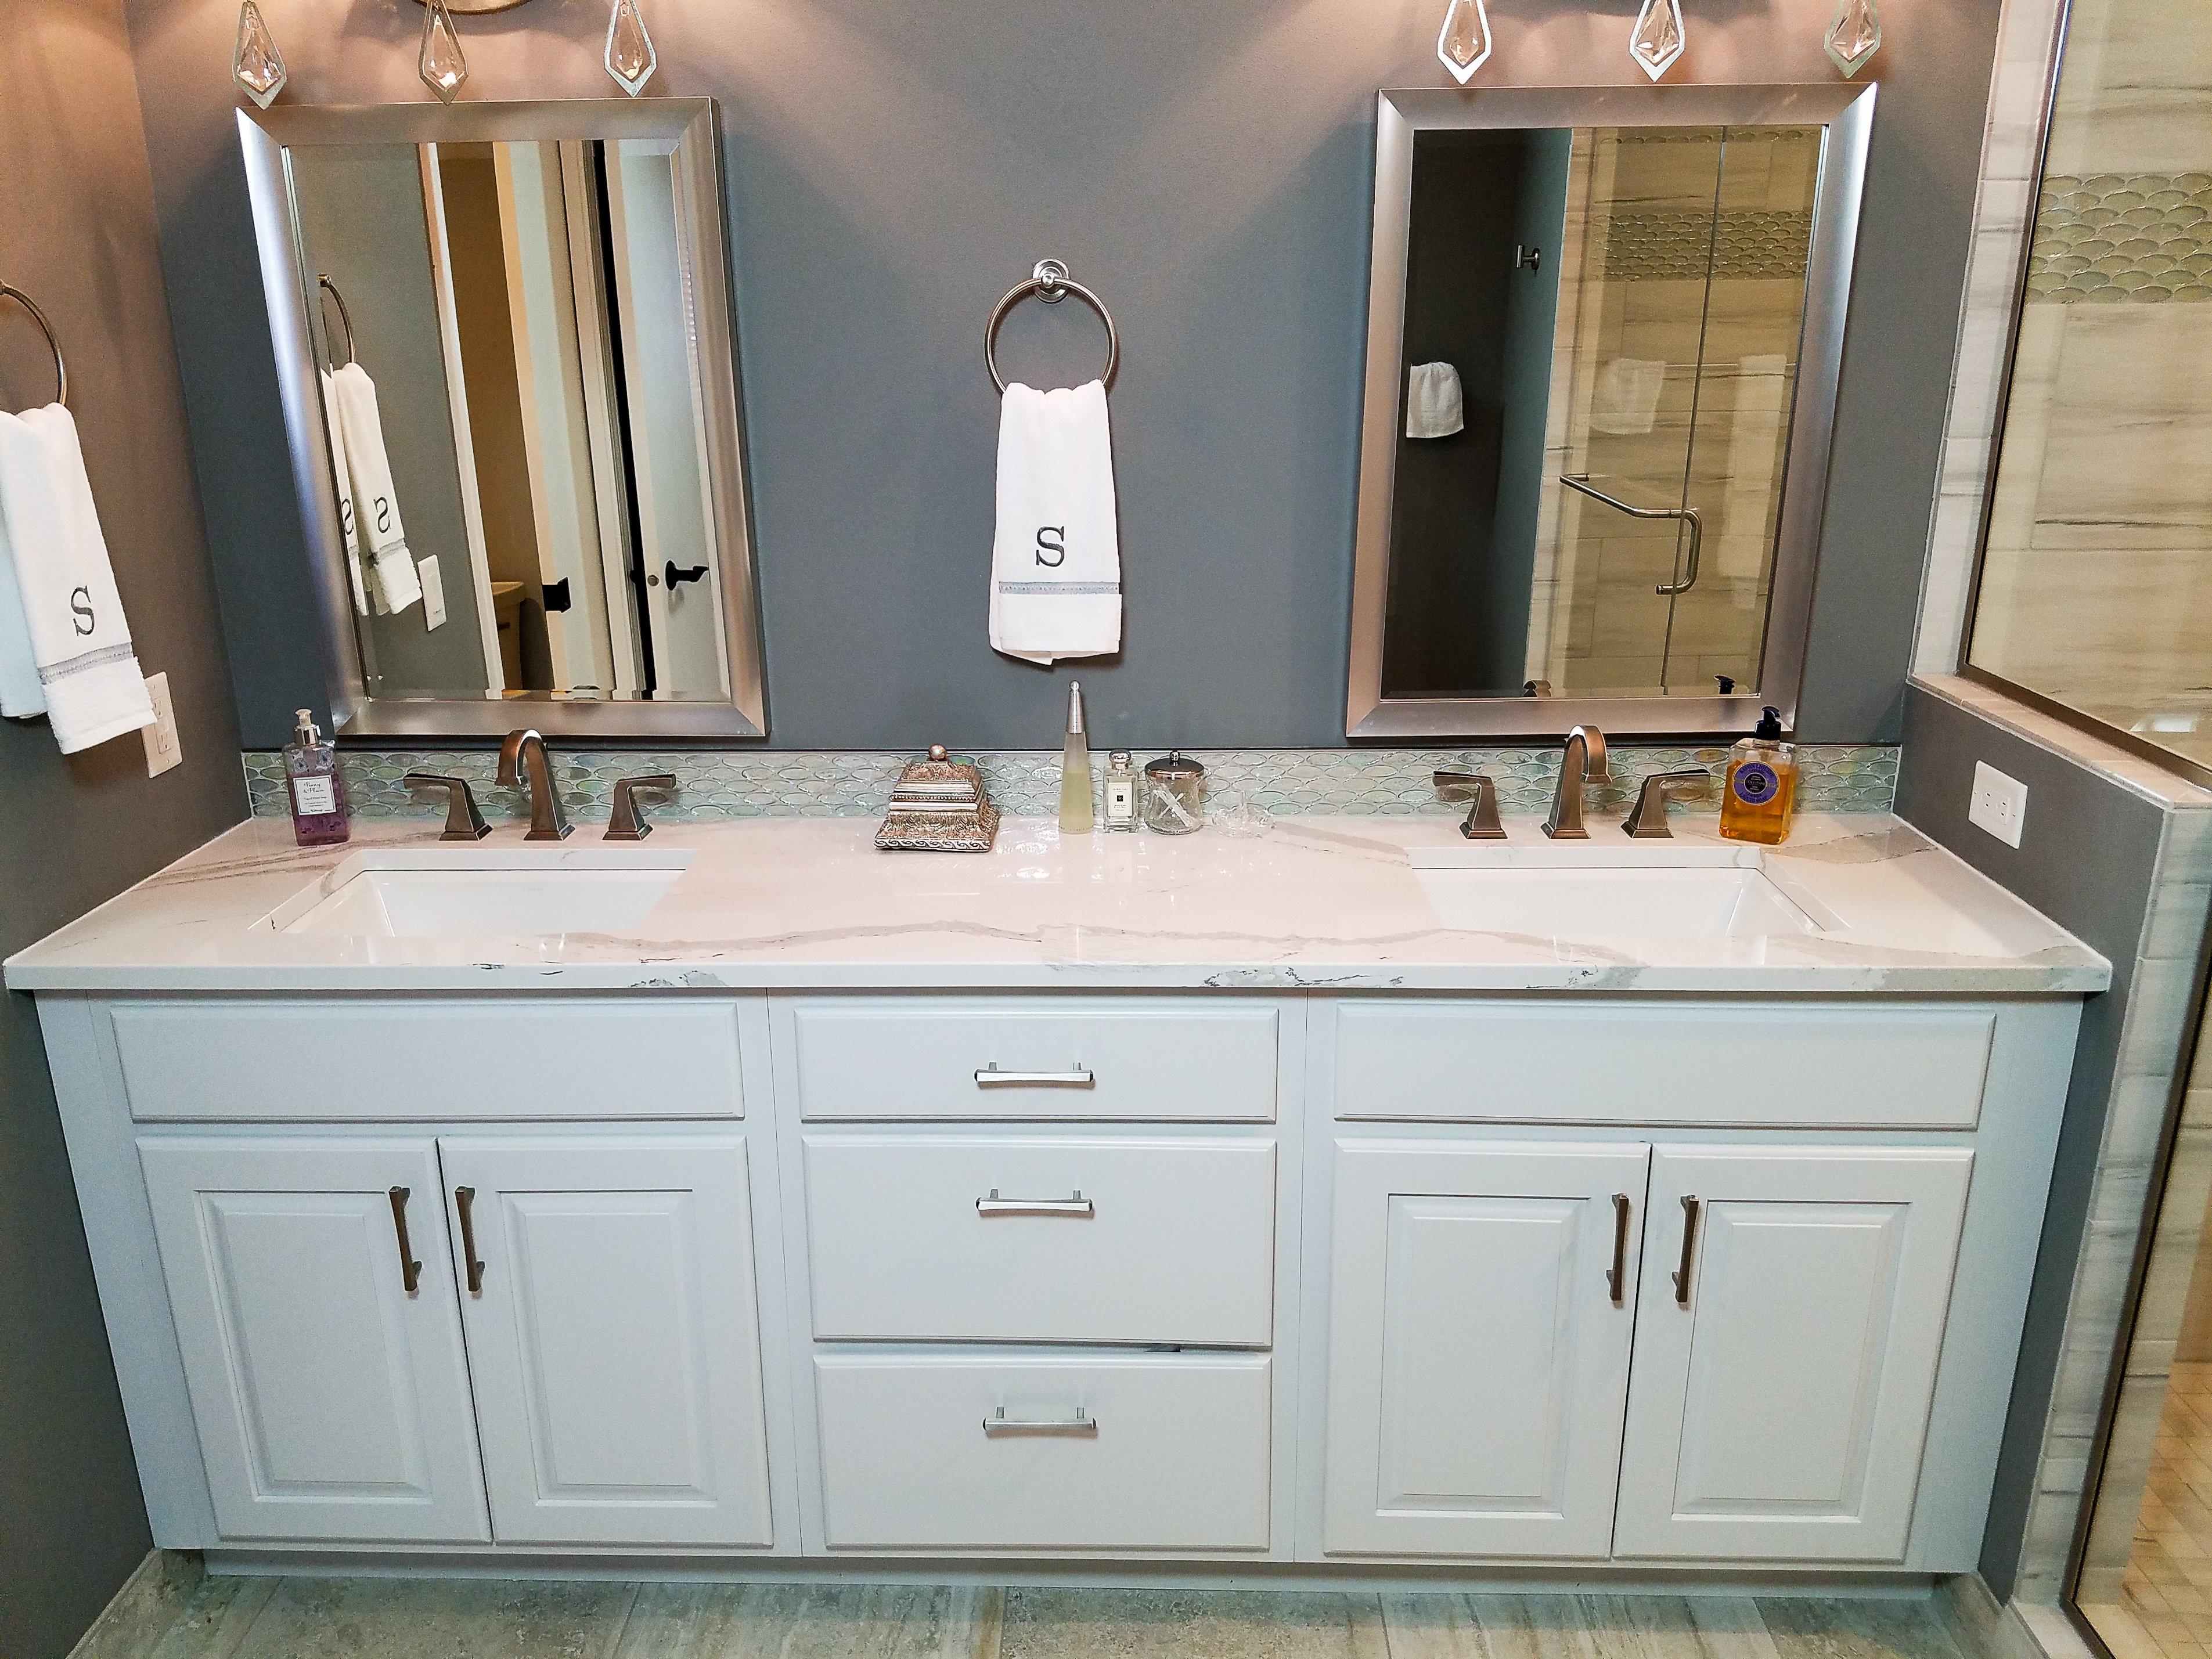 Bathroom Design, double sink vanity design, white vanity cabinets,